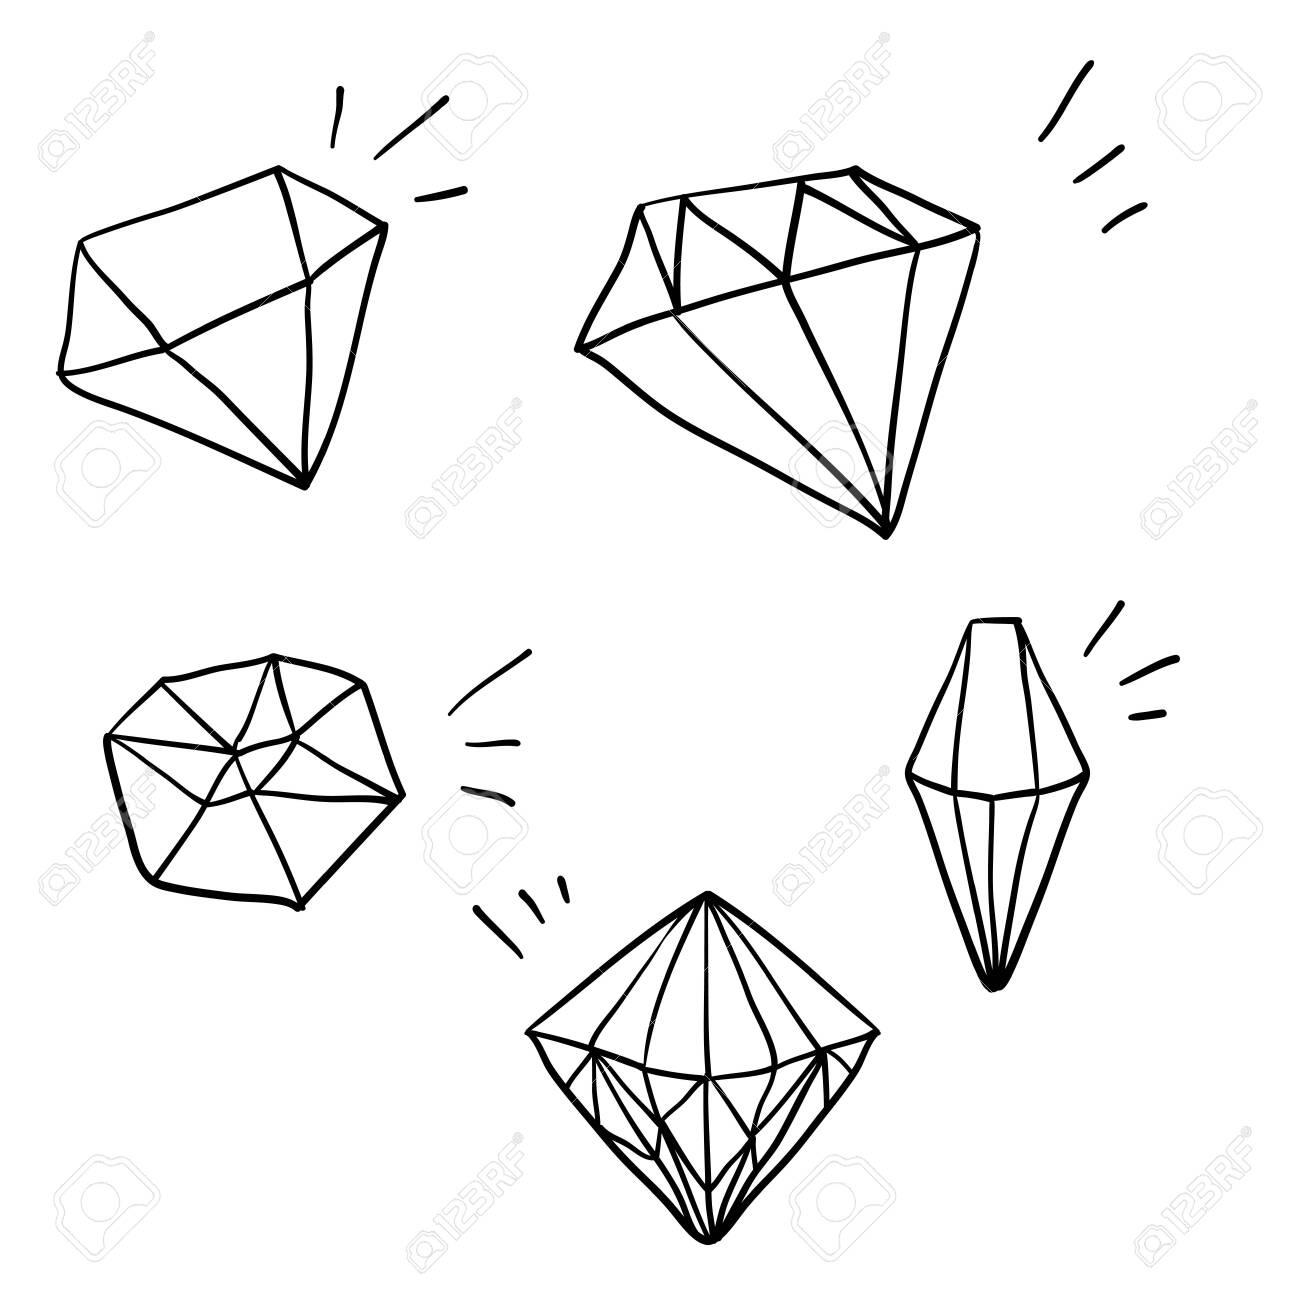 doodle diamond illustration vector with hand drawn cartoon style vector - 137781554